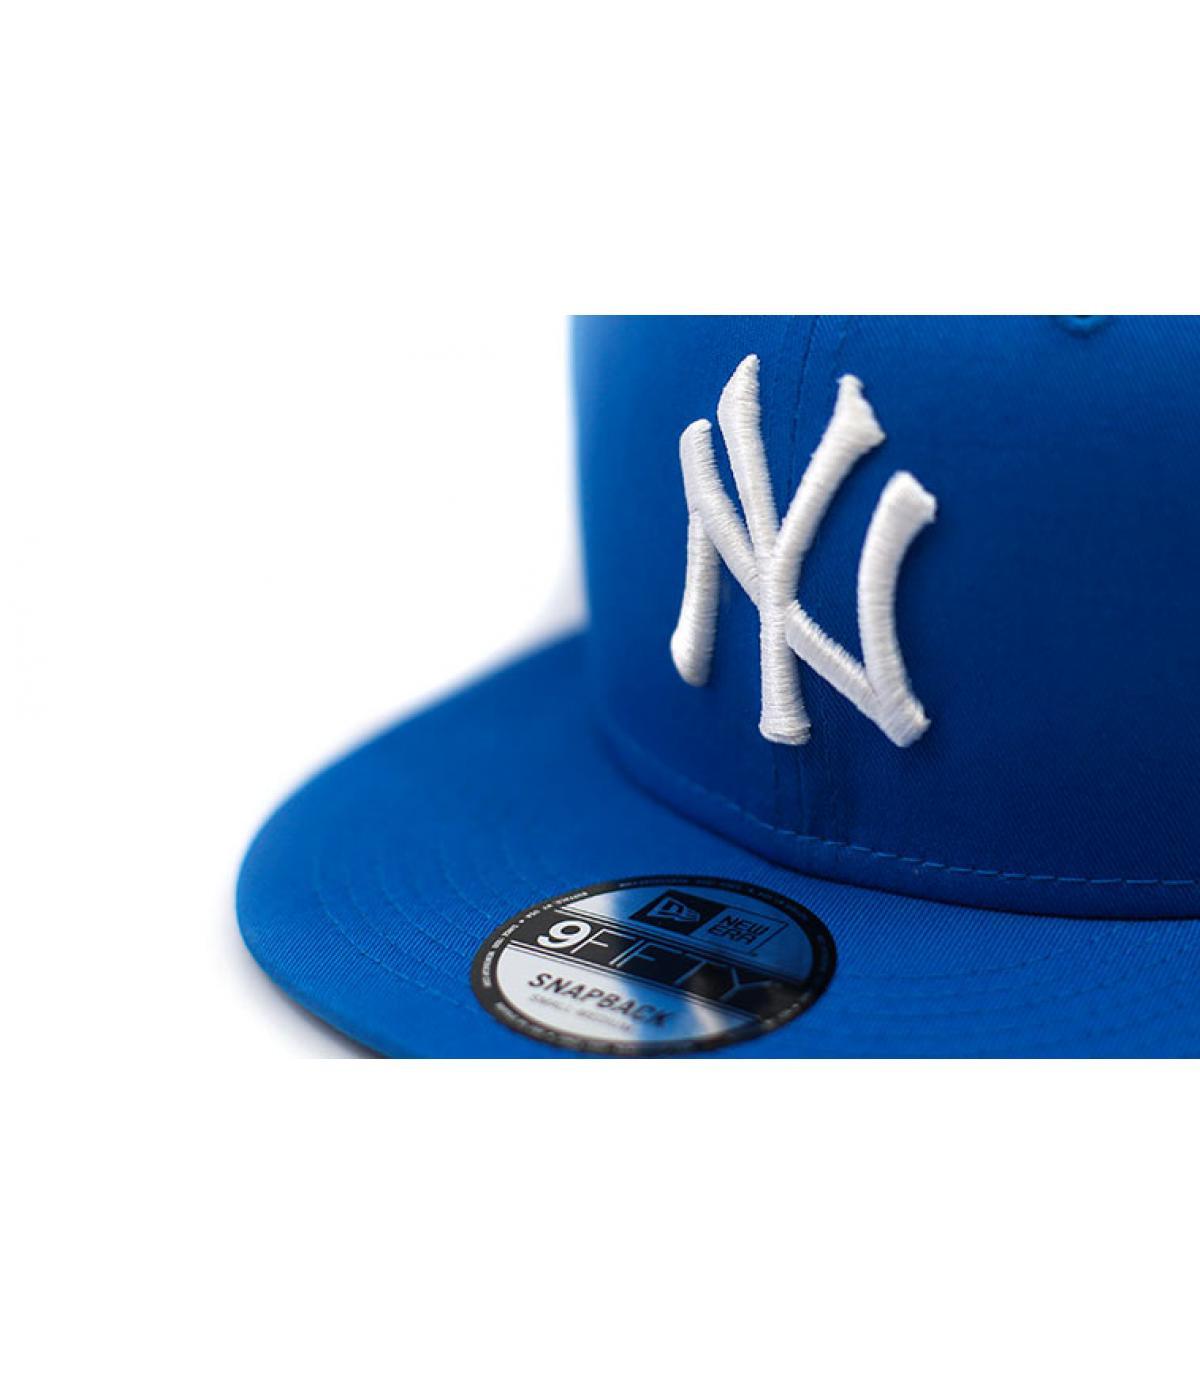 Details Snapback League Ess NY 950 cardinal - Abbildung 3